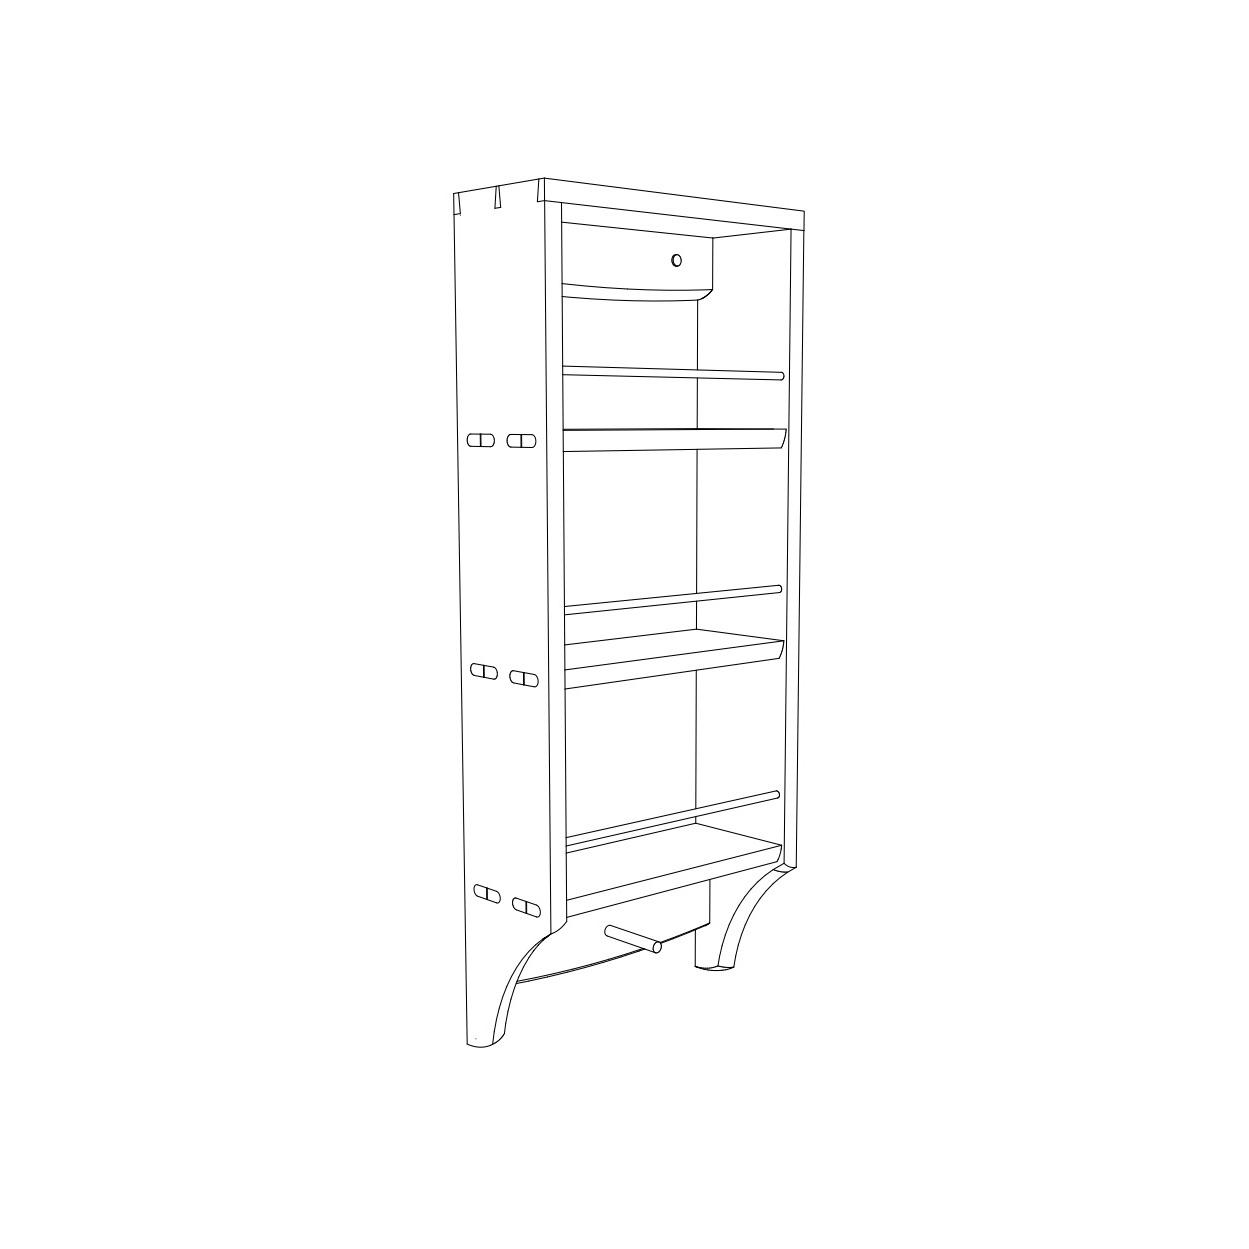 sketchup drawing of a tea rack